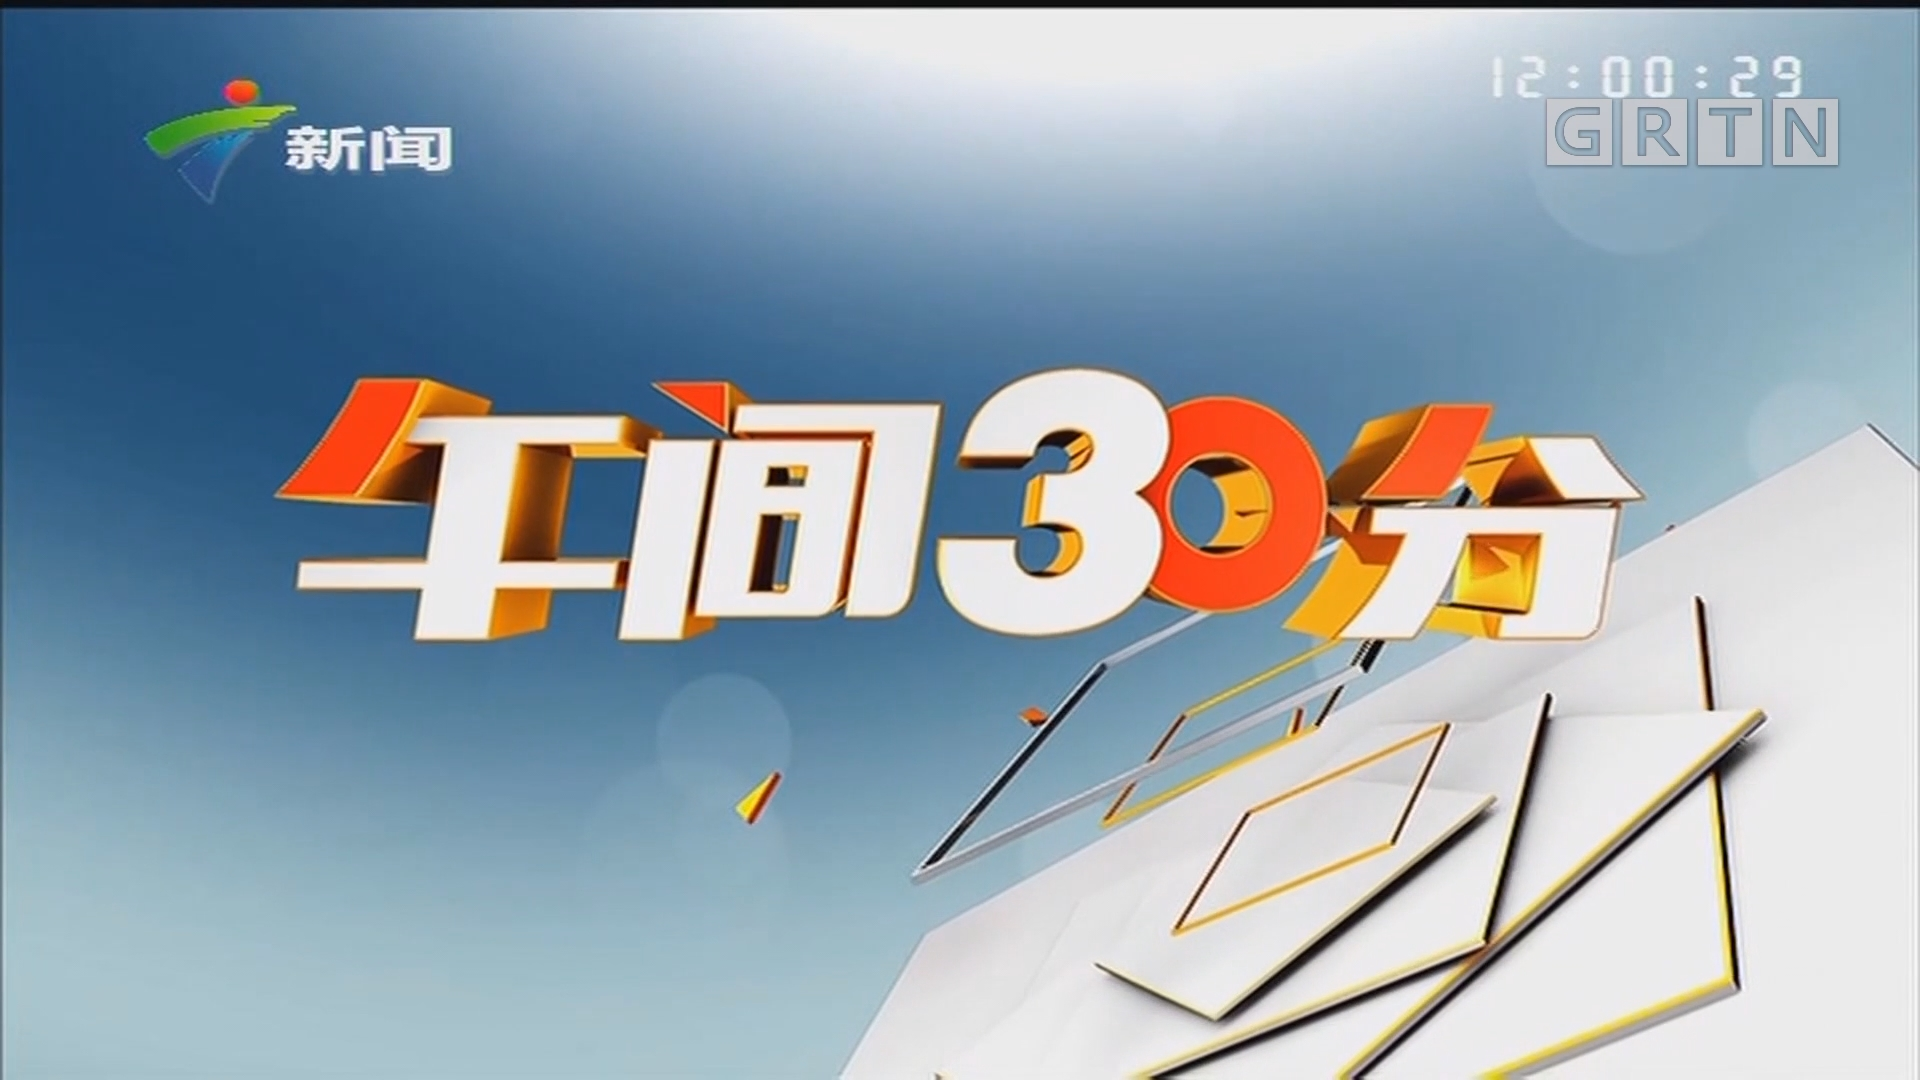 [HD][2019-10-08]午间30分:国庆黄金周:广东共接待游客5507.7万 收入464.9亿元